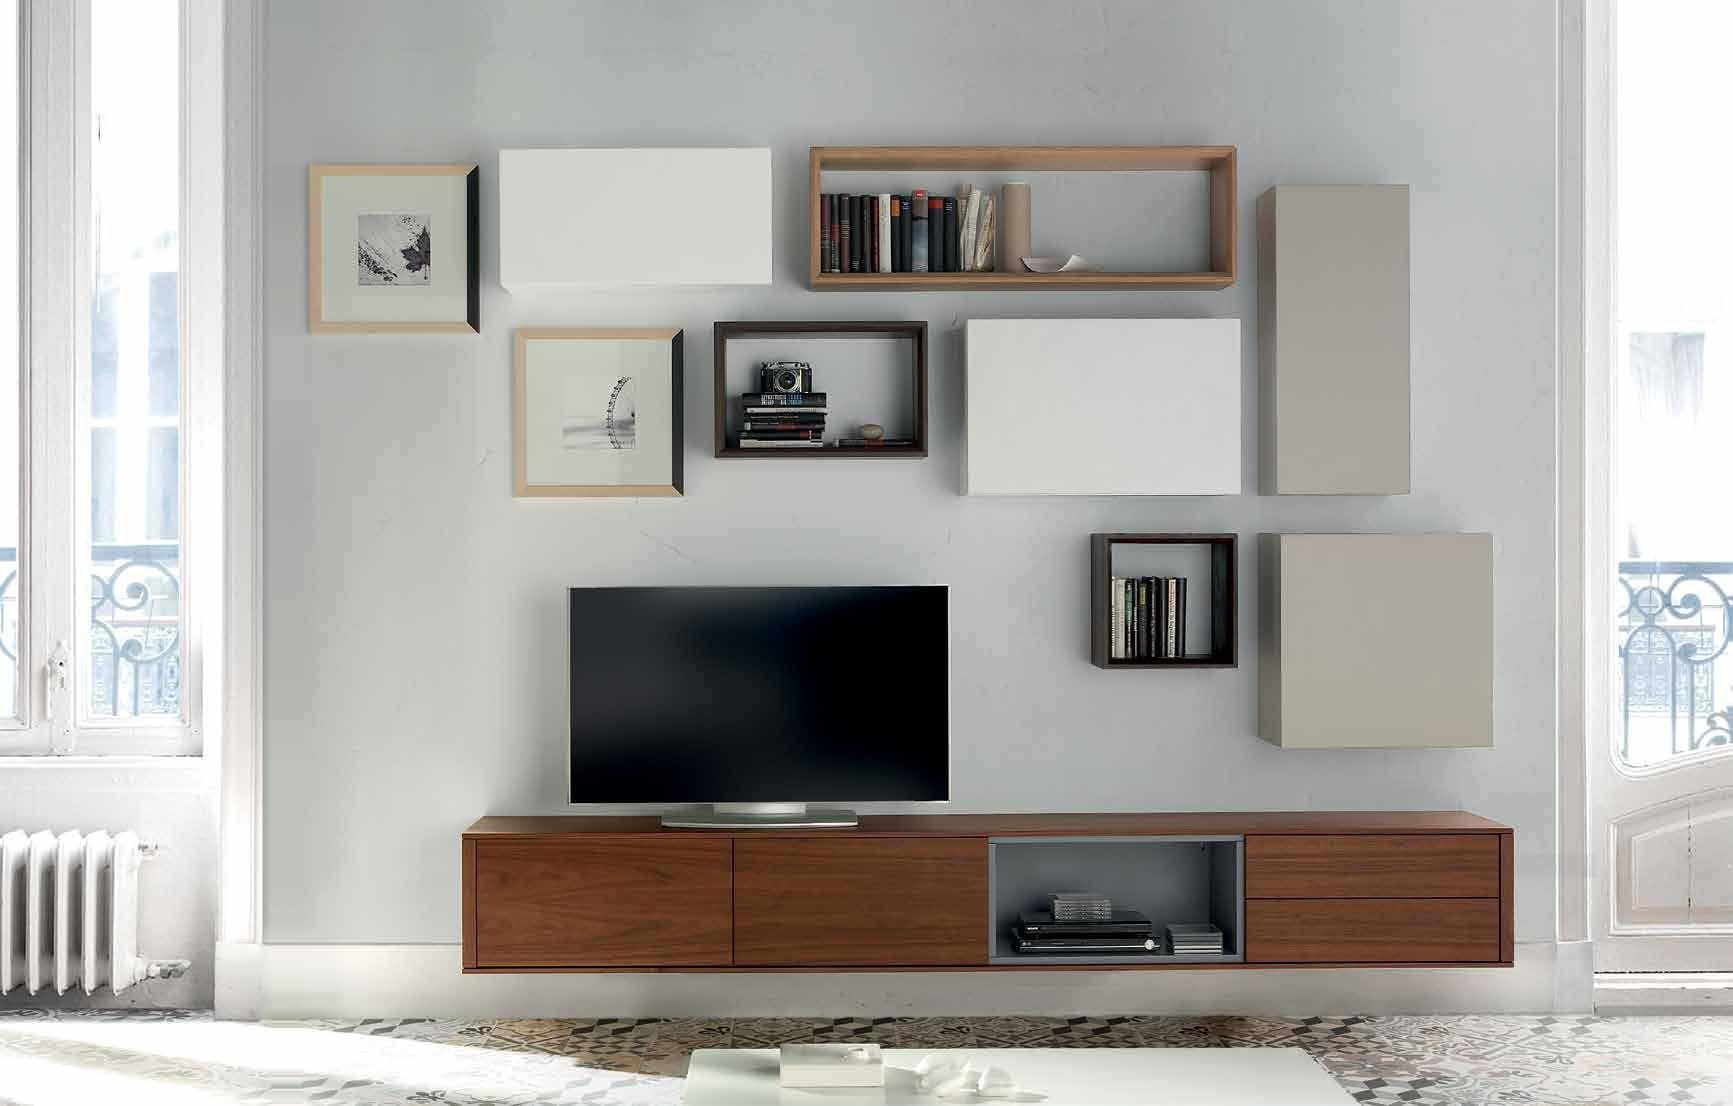 Muebles De Salon De Diseo Moderno Muebles Salon Diseno Baratos  # Muebles Puchades